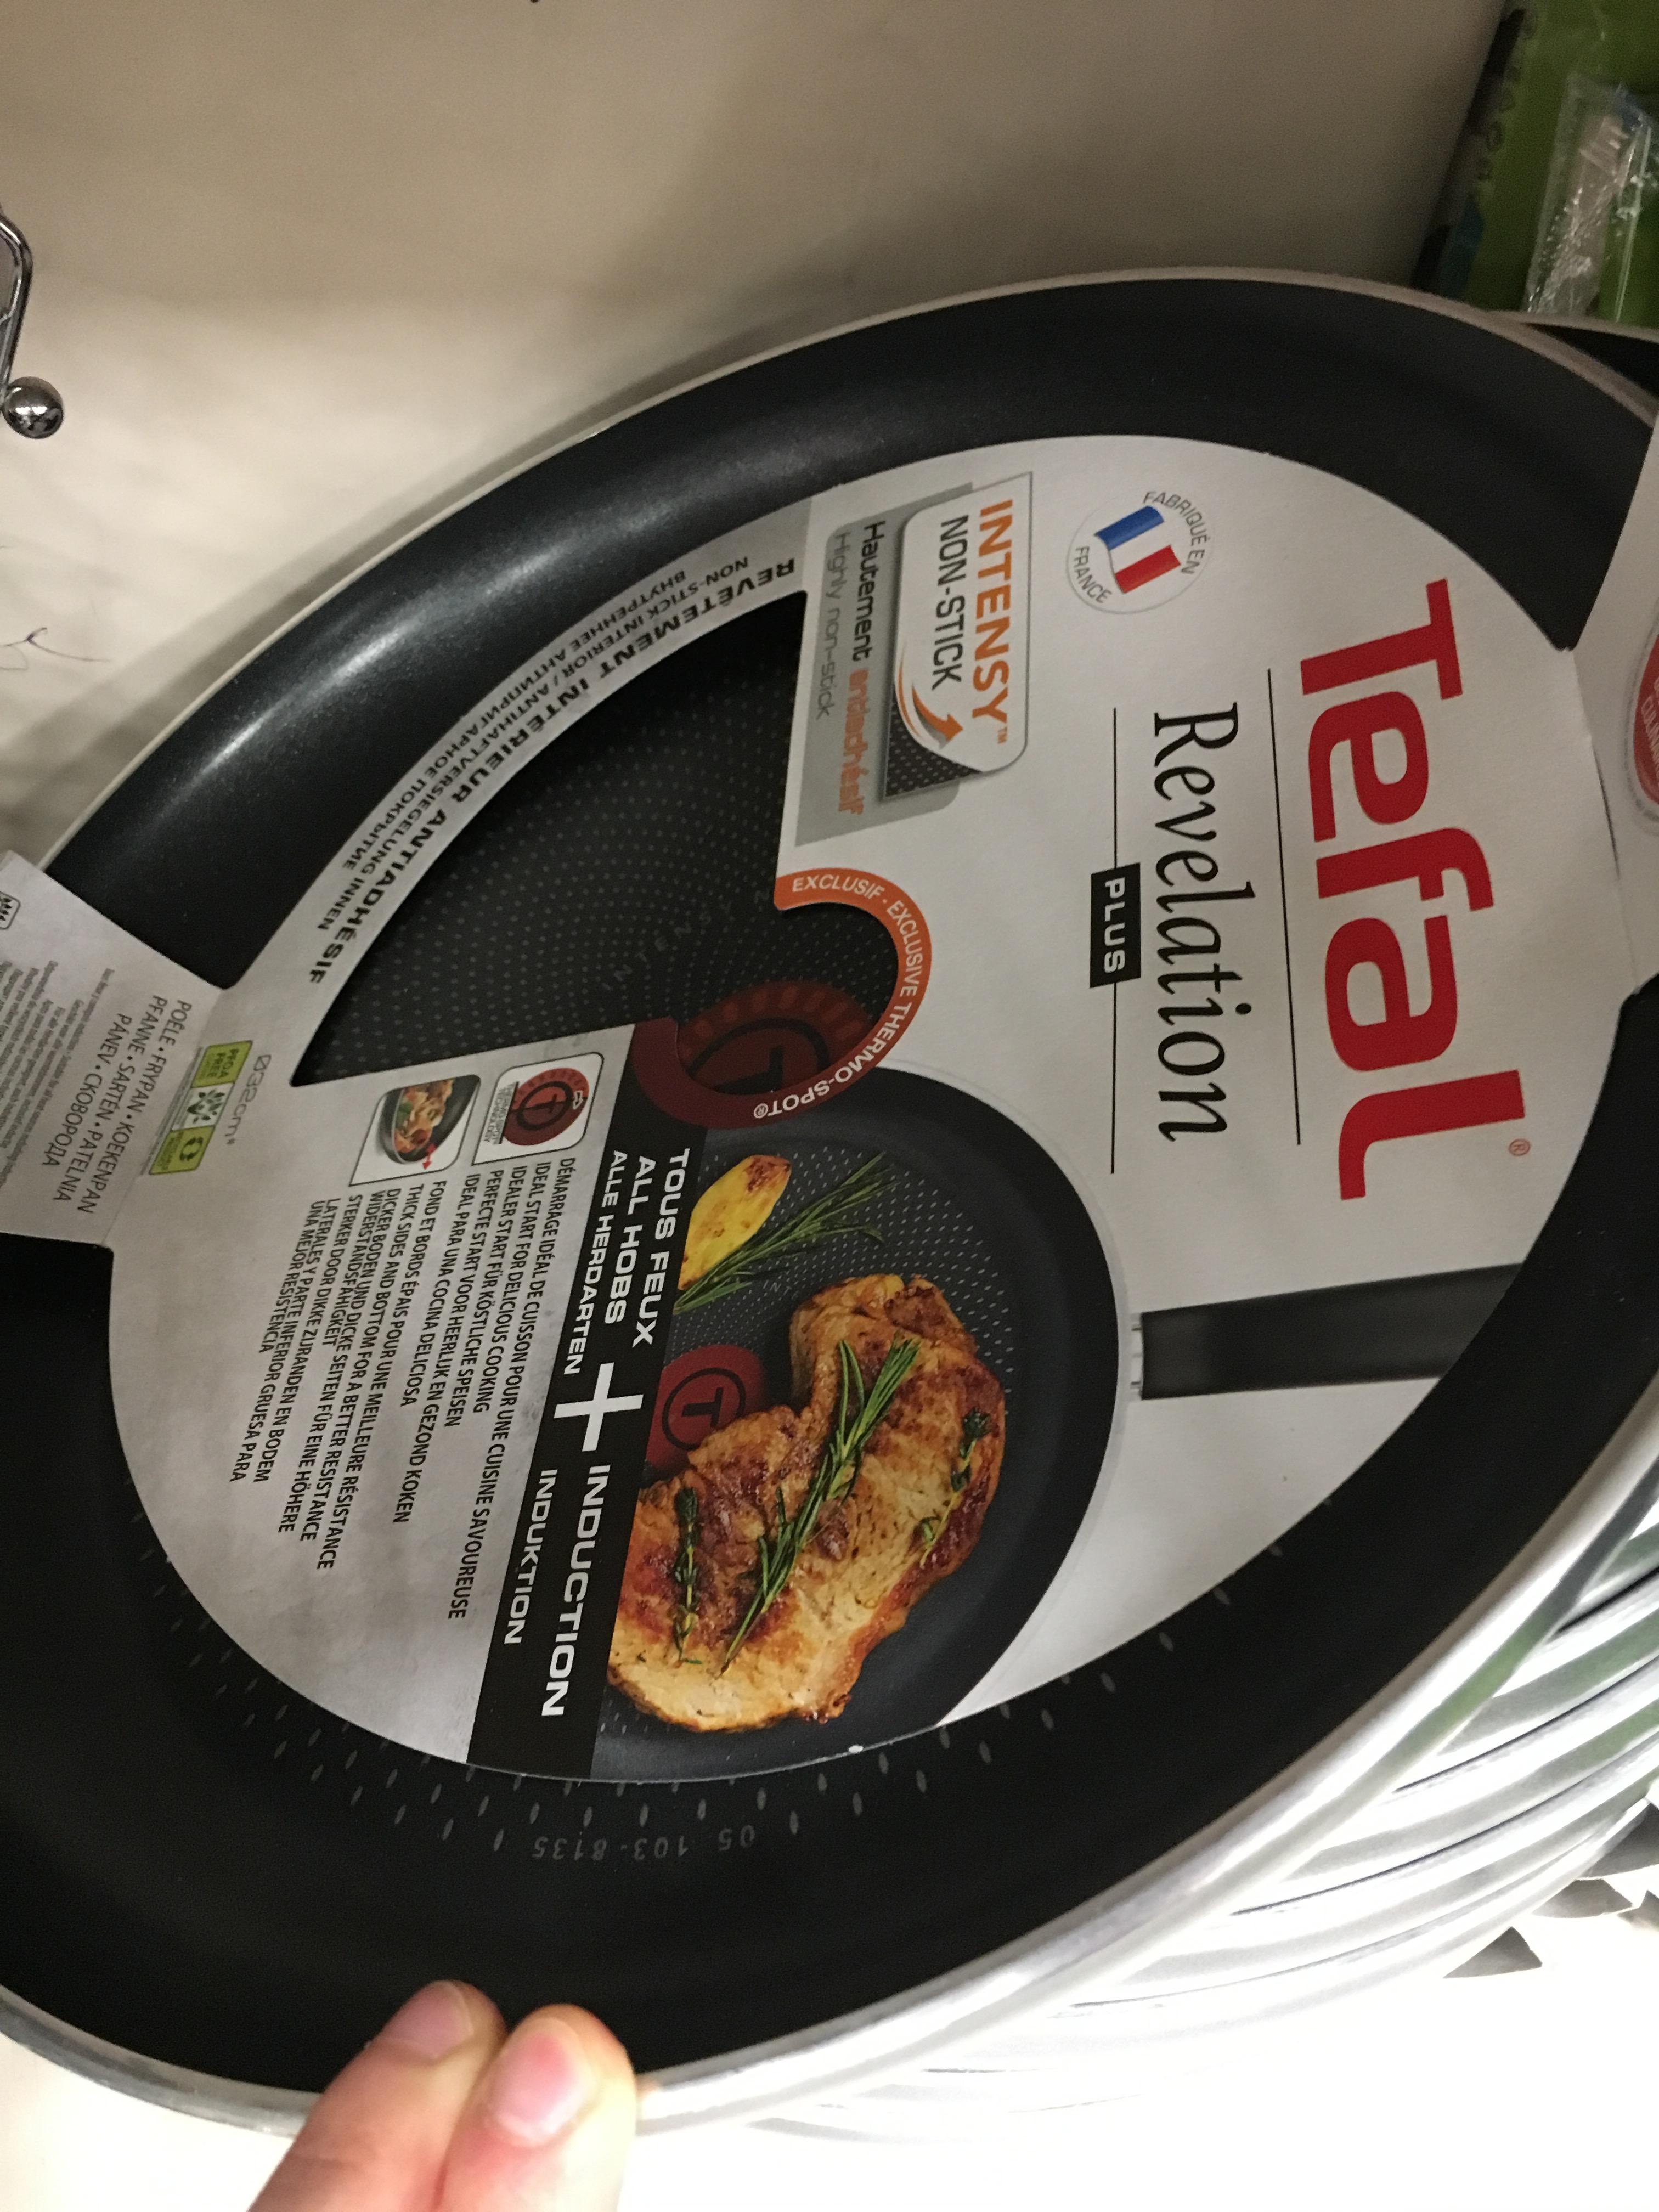 Tefal Revelation Plus Frying Pan 32cm £15.75 RRP £30 @ Sainsbury's London Cannon Street